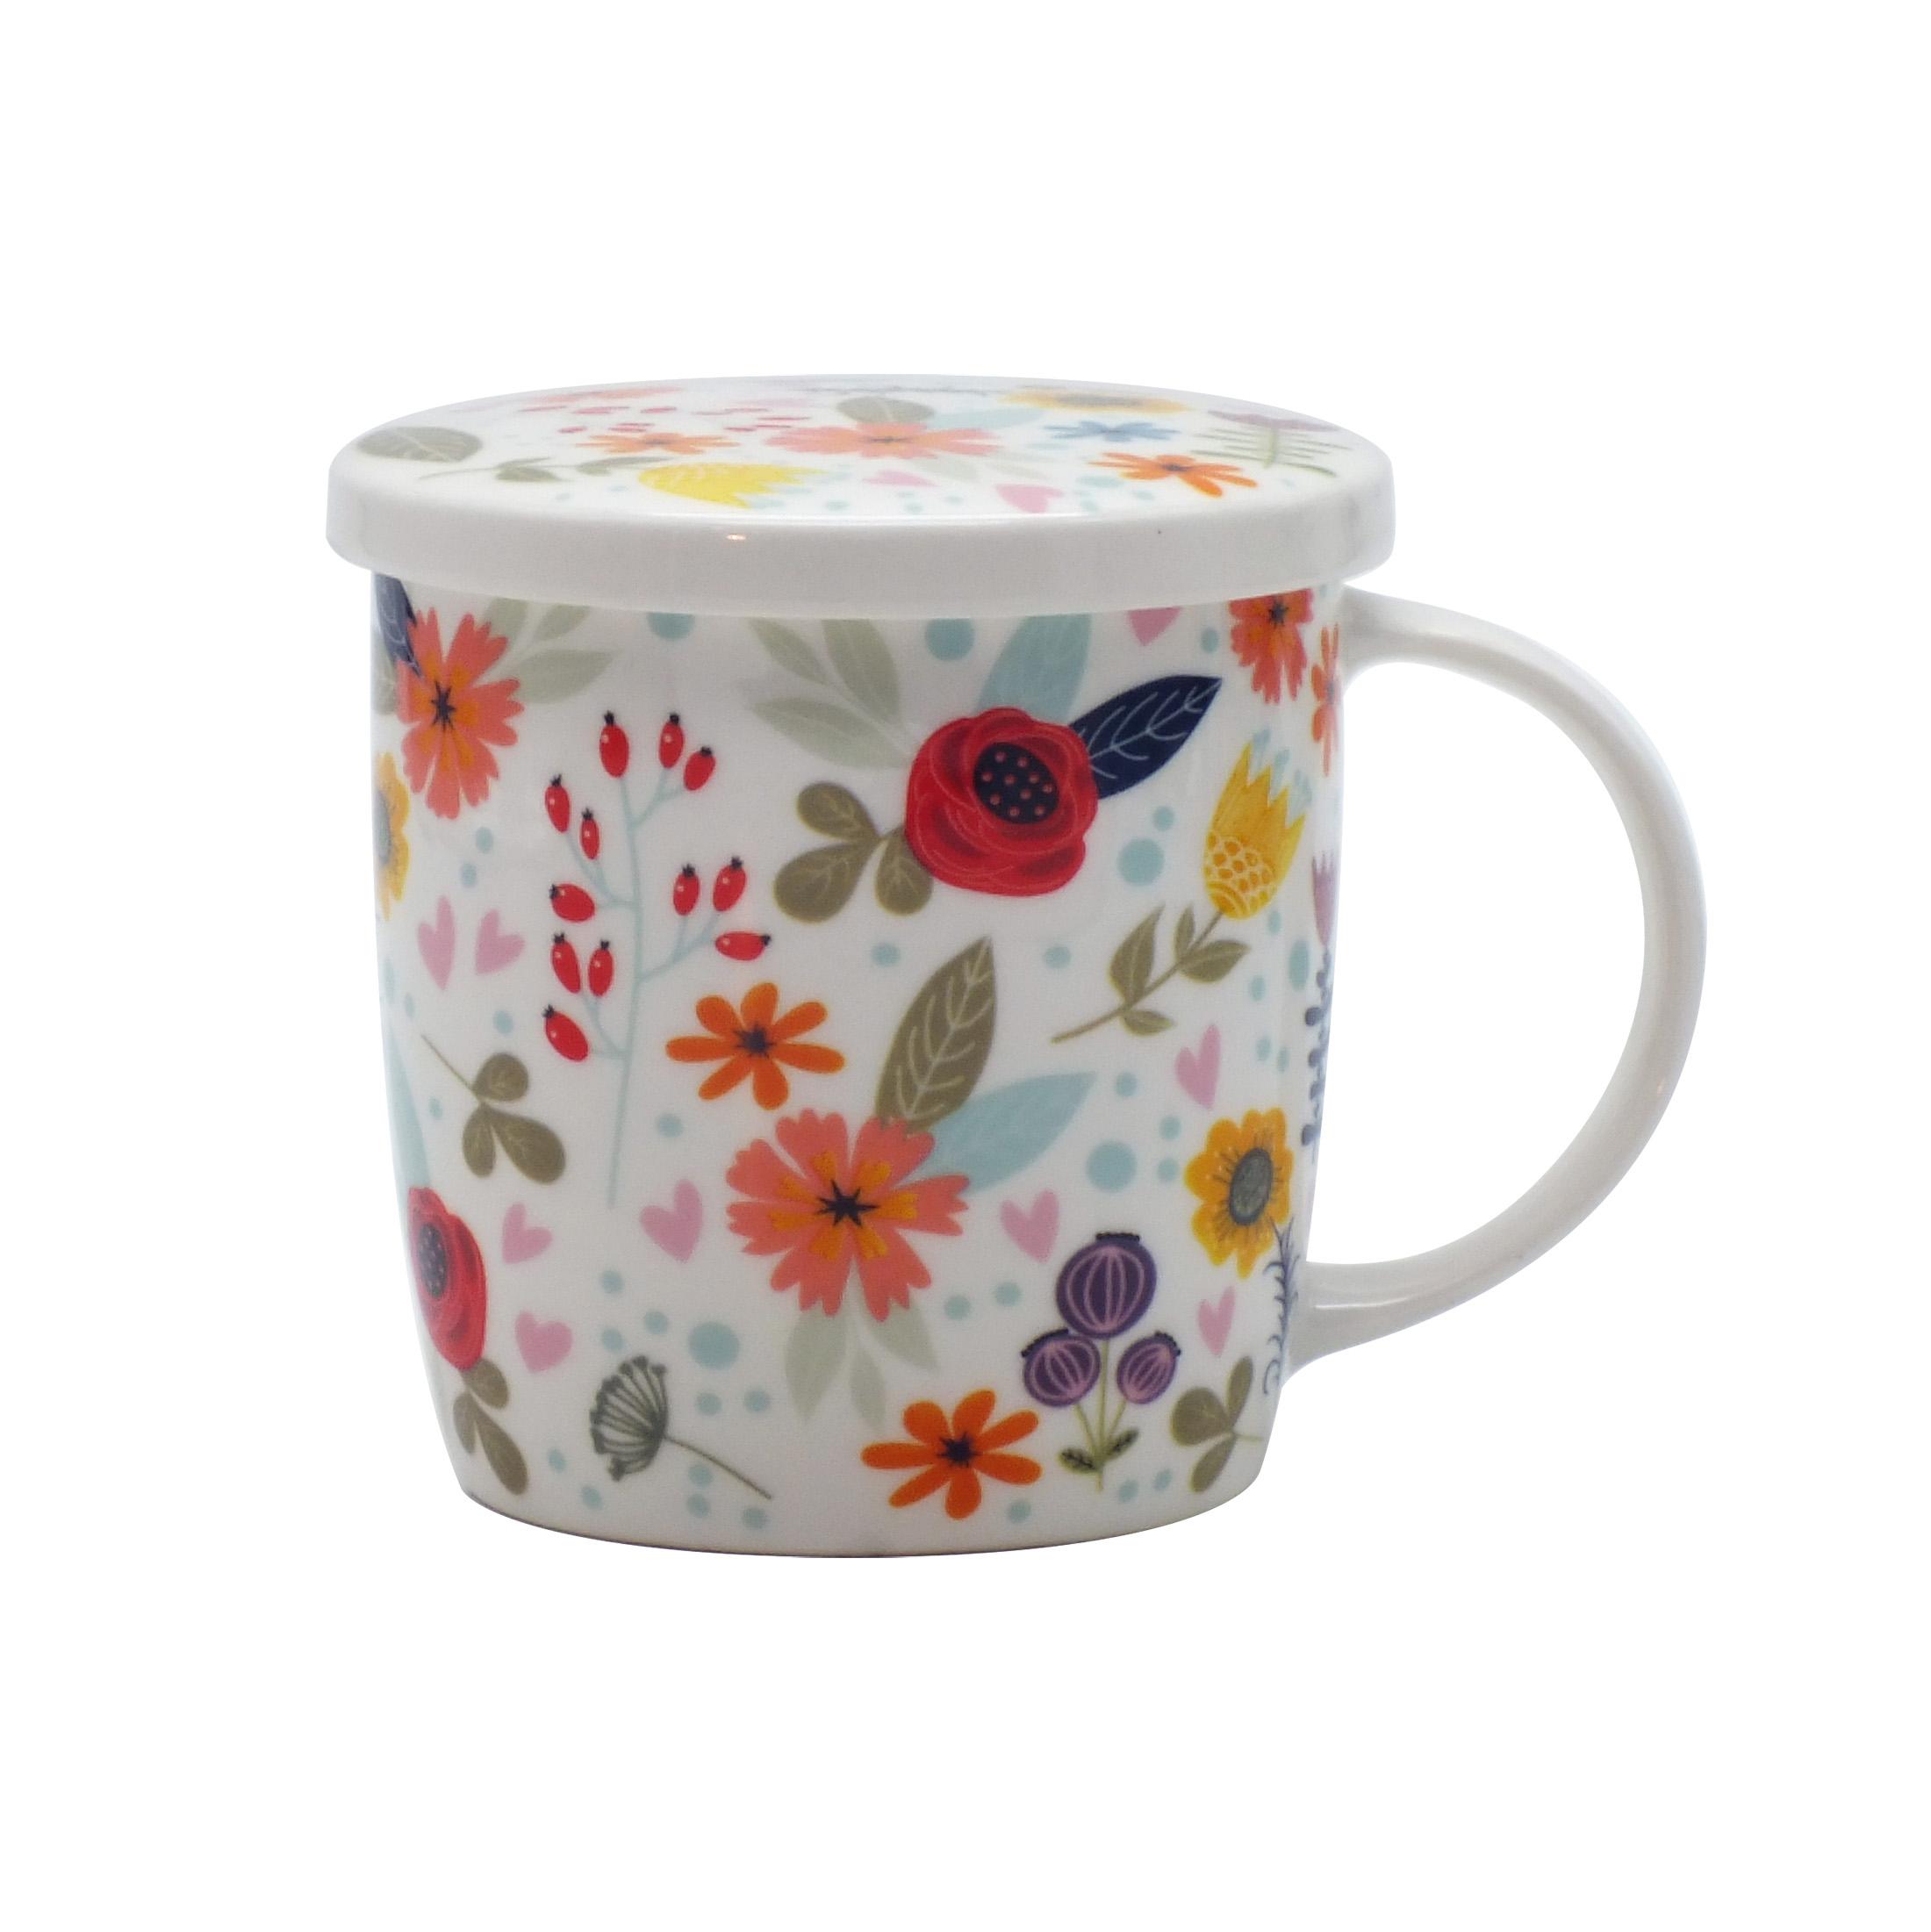 Handmade Stoneware 400 ml Mug with Quince Flower Detail